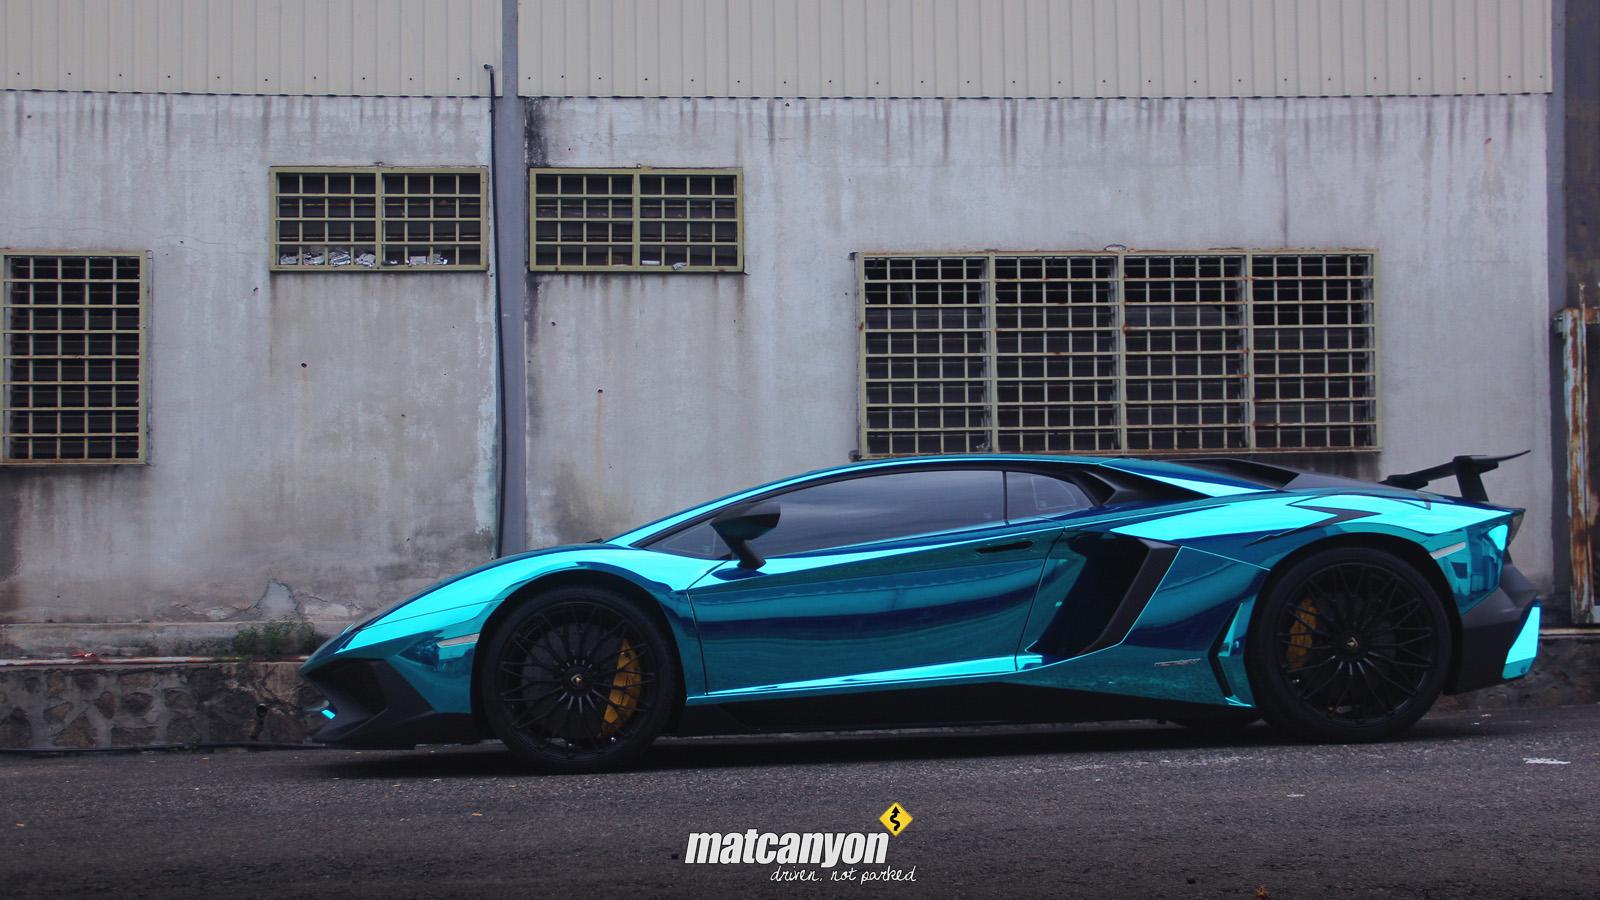 Mat Canyon: Vivid Dreams | Lamborghini Aventador LP 750-4 SV on wrapped laferrari, wrapped pagani huayra, wrapped ford fiesta, wrapped lincoln navigator, wrapped bugatti, wrapped jaguar xj, wrapped ford edge, wrapped ford excursion, wrapped mercedes cla, wrapped toyota sienna, wrapped nissan gt-r, wrapped jaguar xf, wrapped jeep wrangler, wrapped jeep grand cherokee, wrapped toyota supra, wrapped lamborghini gallardo,